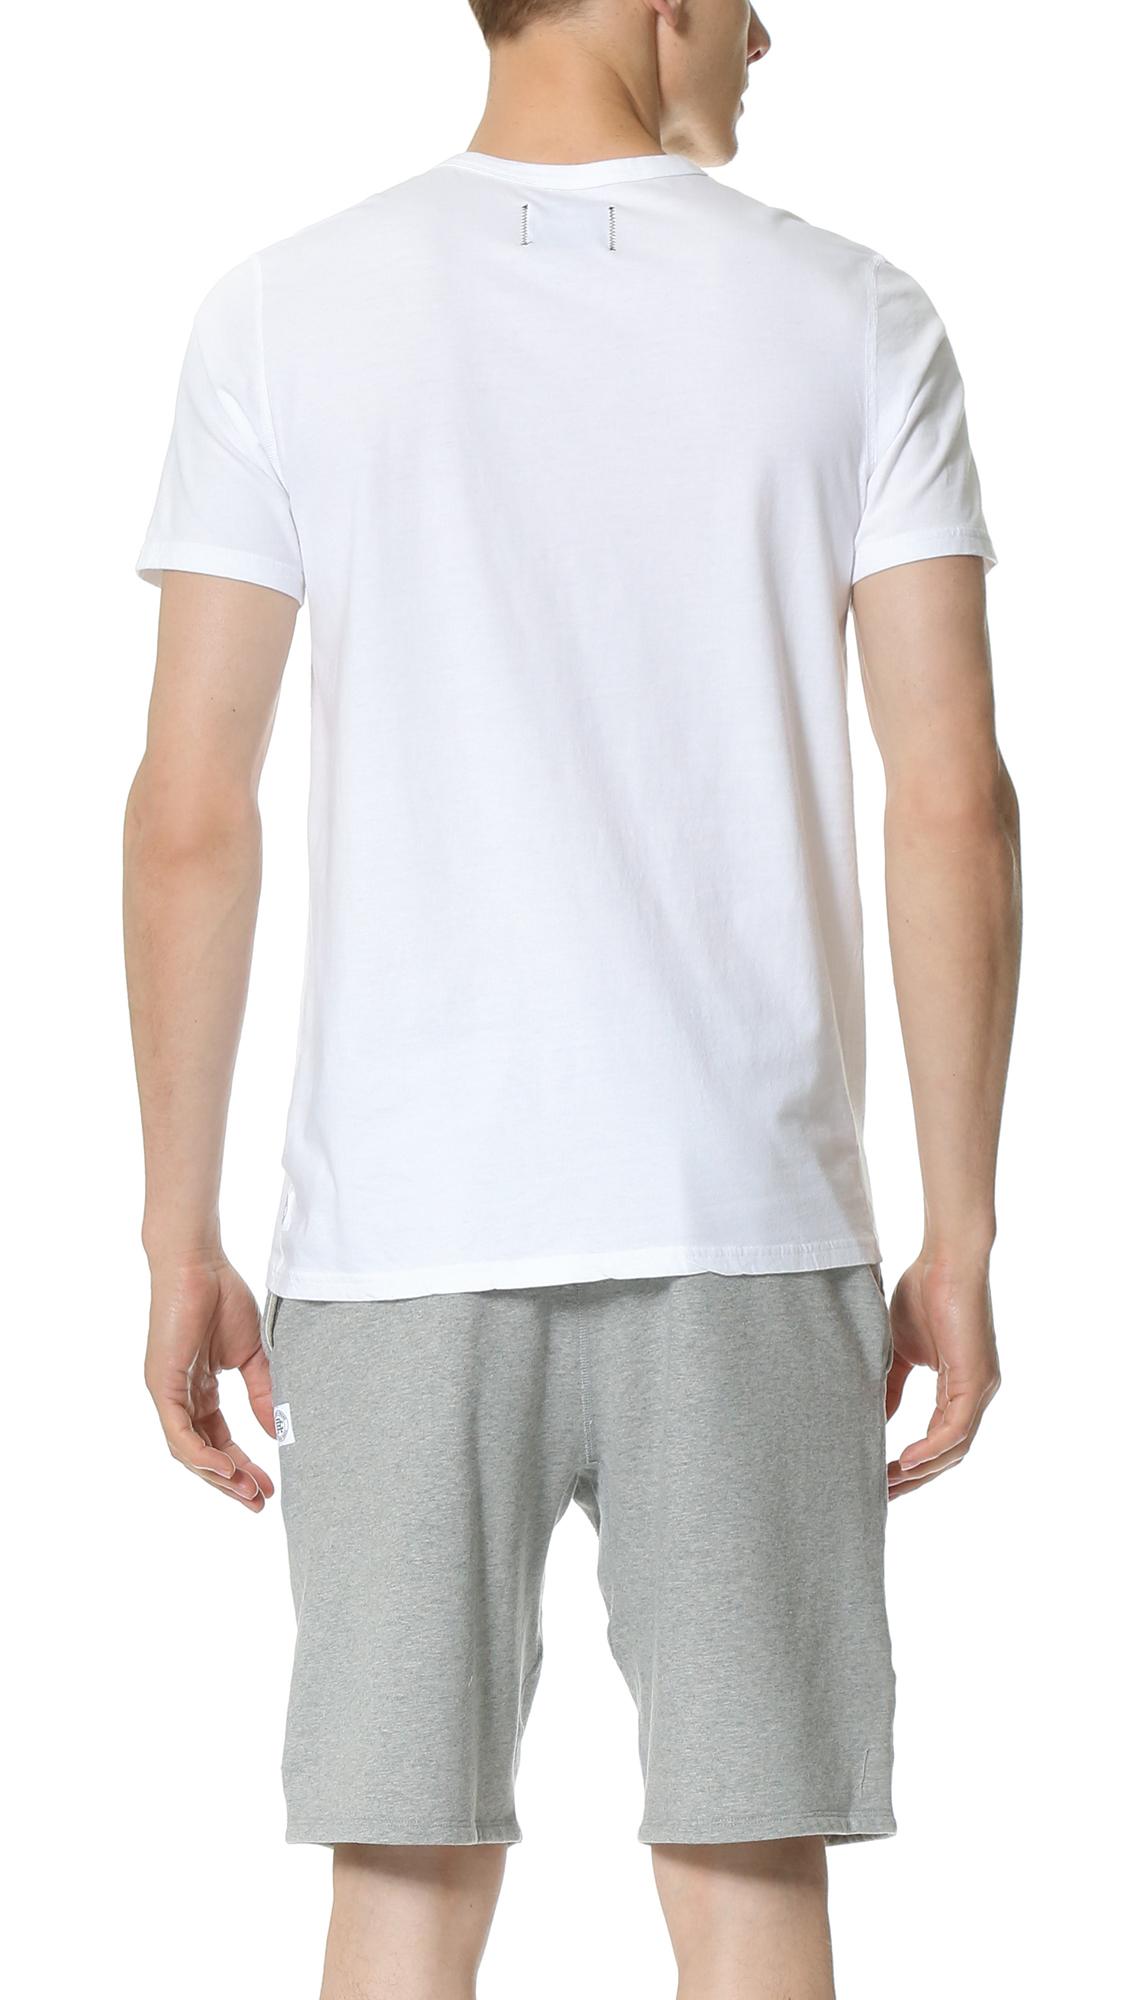 ceb089fcef0 Reigning Champ T-Shirt 2 Pack